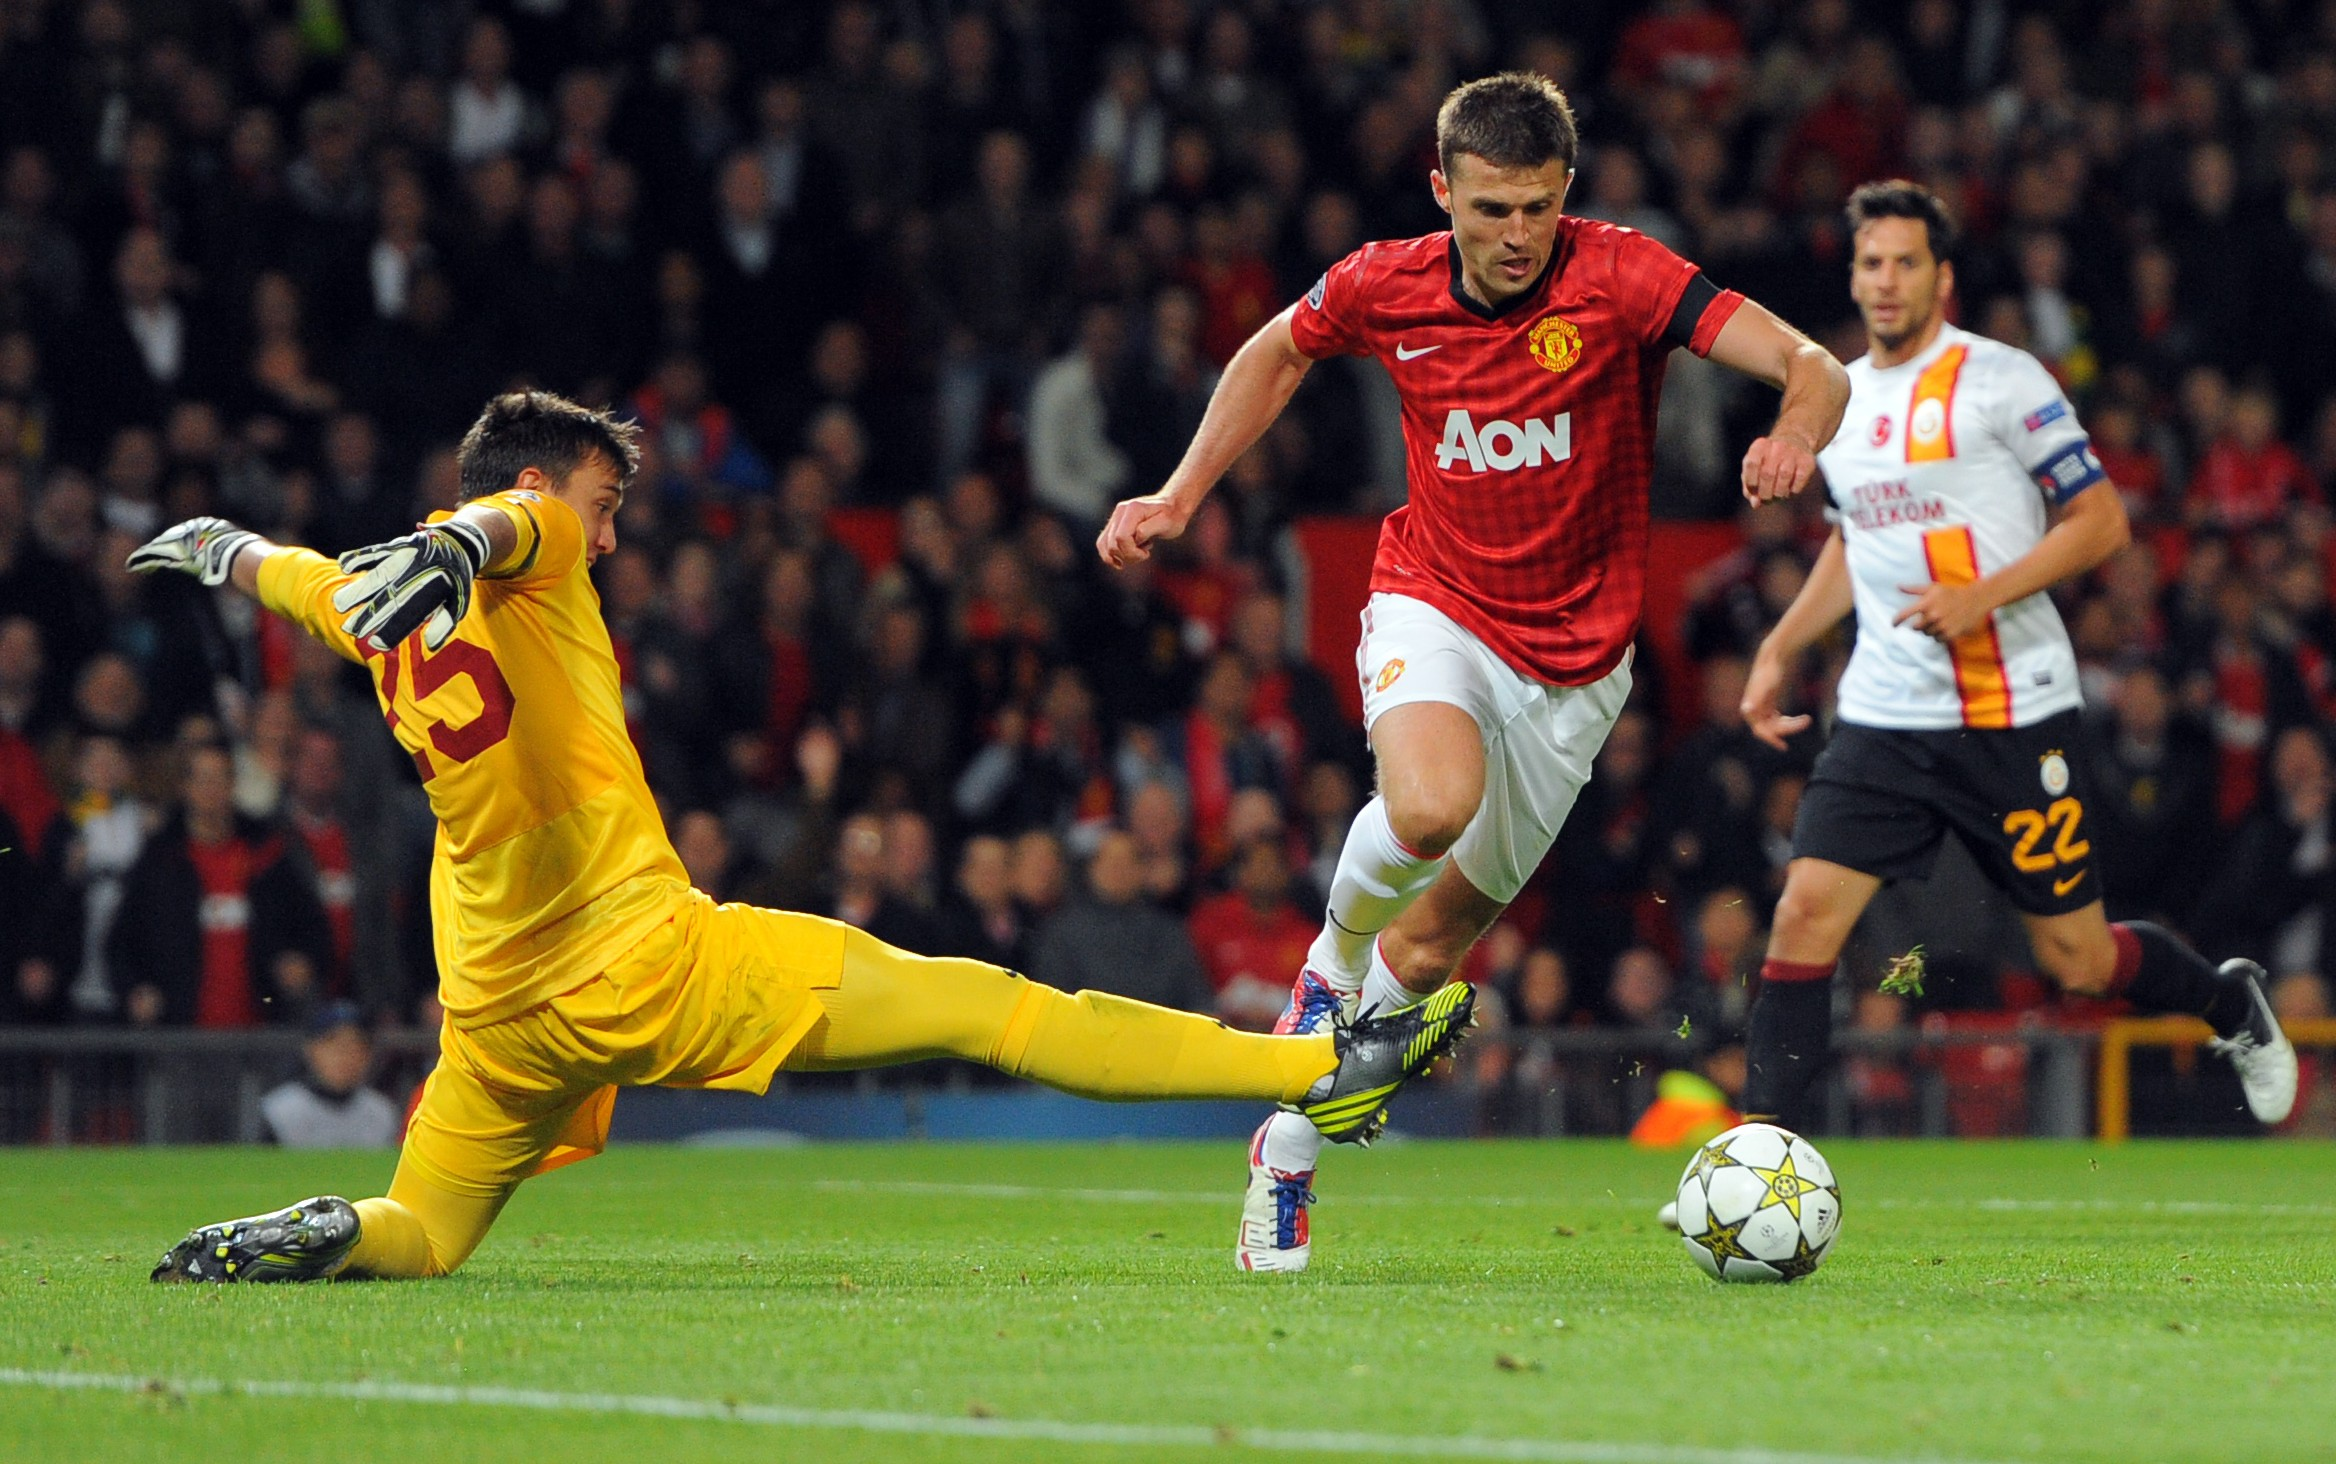 Manchester United's British midfielder Michael Carrick (C) beats